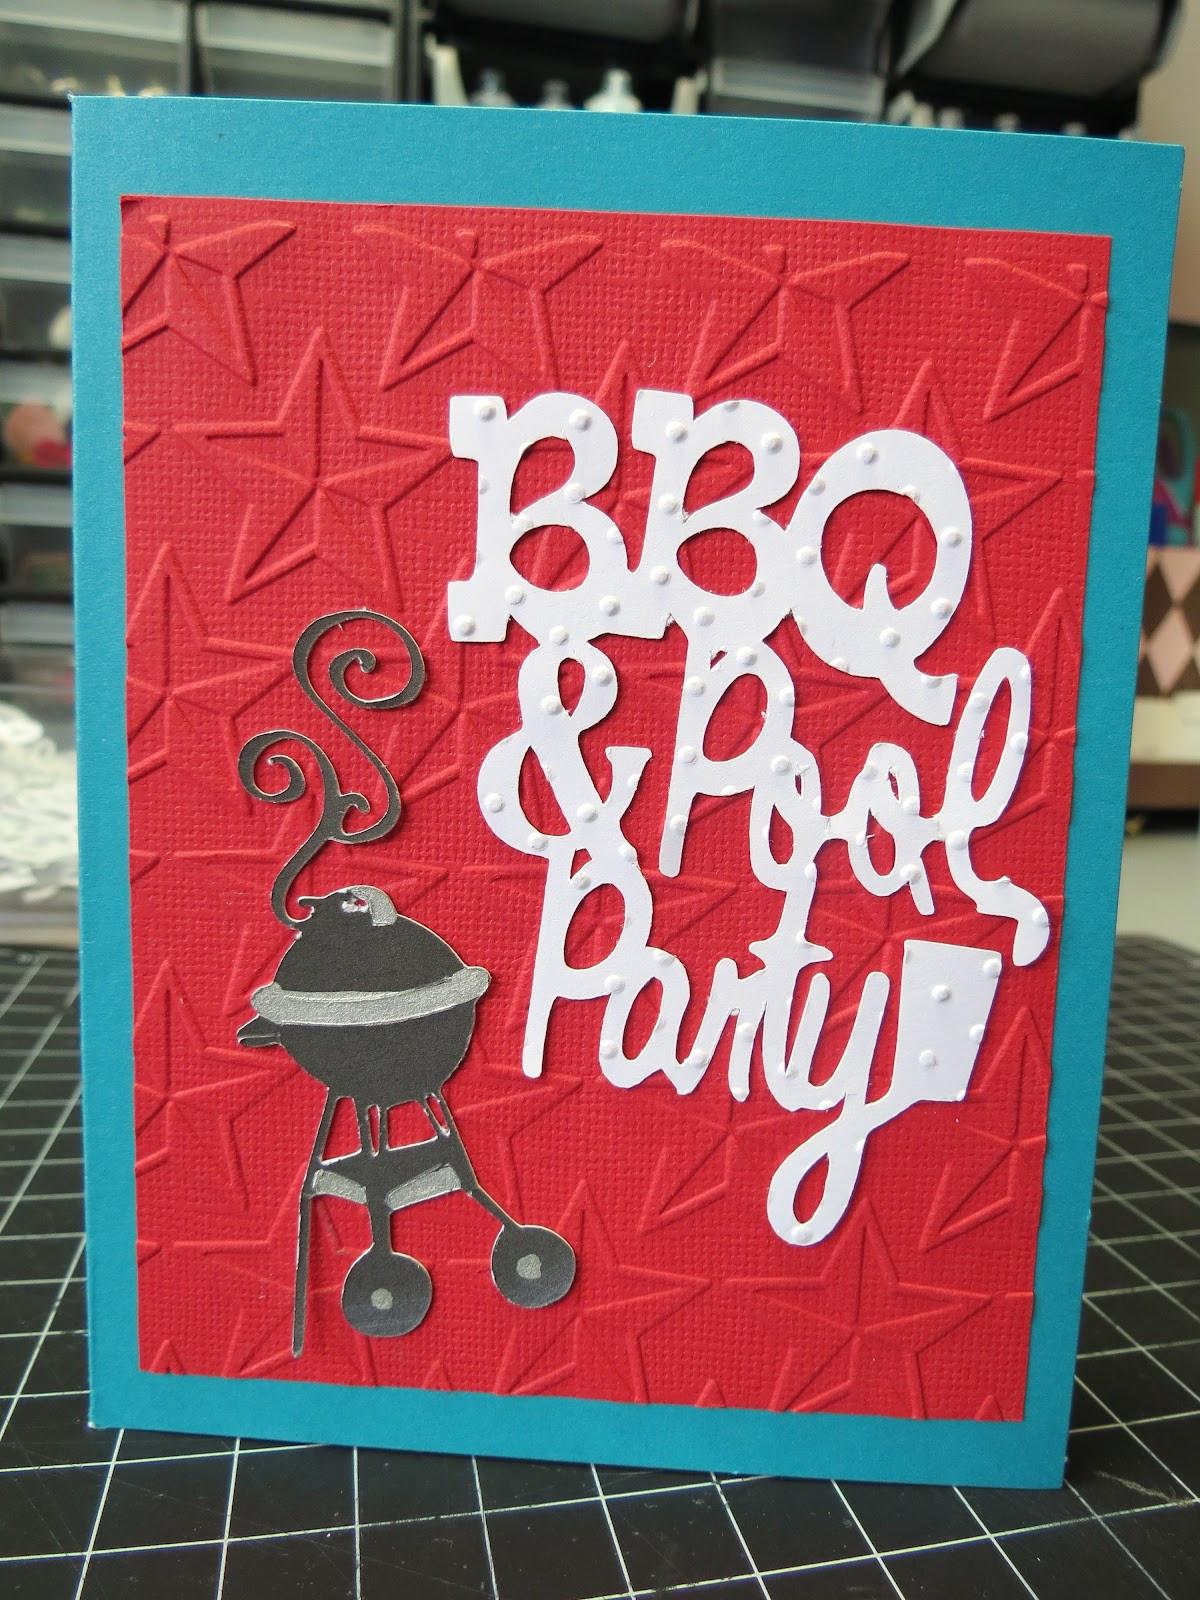 Bbq Pool Party Ideas  C est La Vie Designs Unltd LLC BBQ and Pool Party Invite